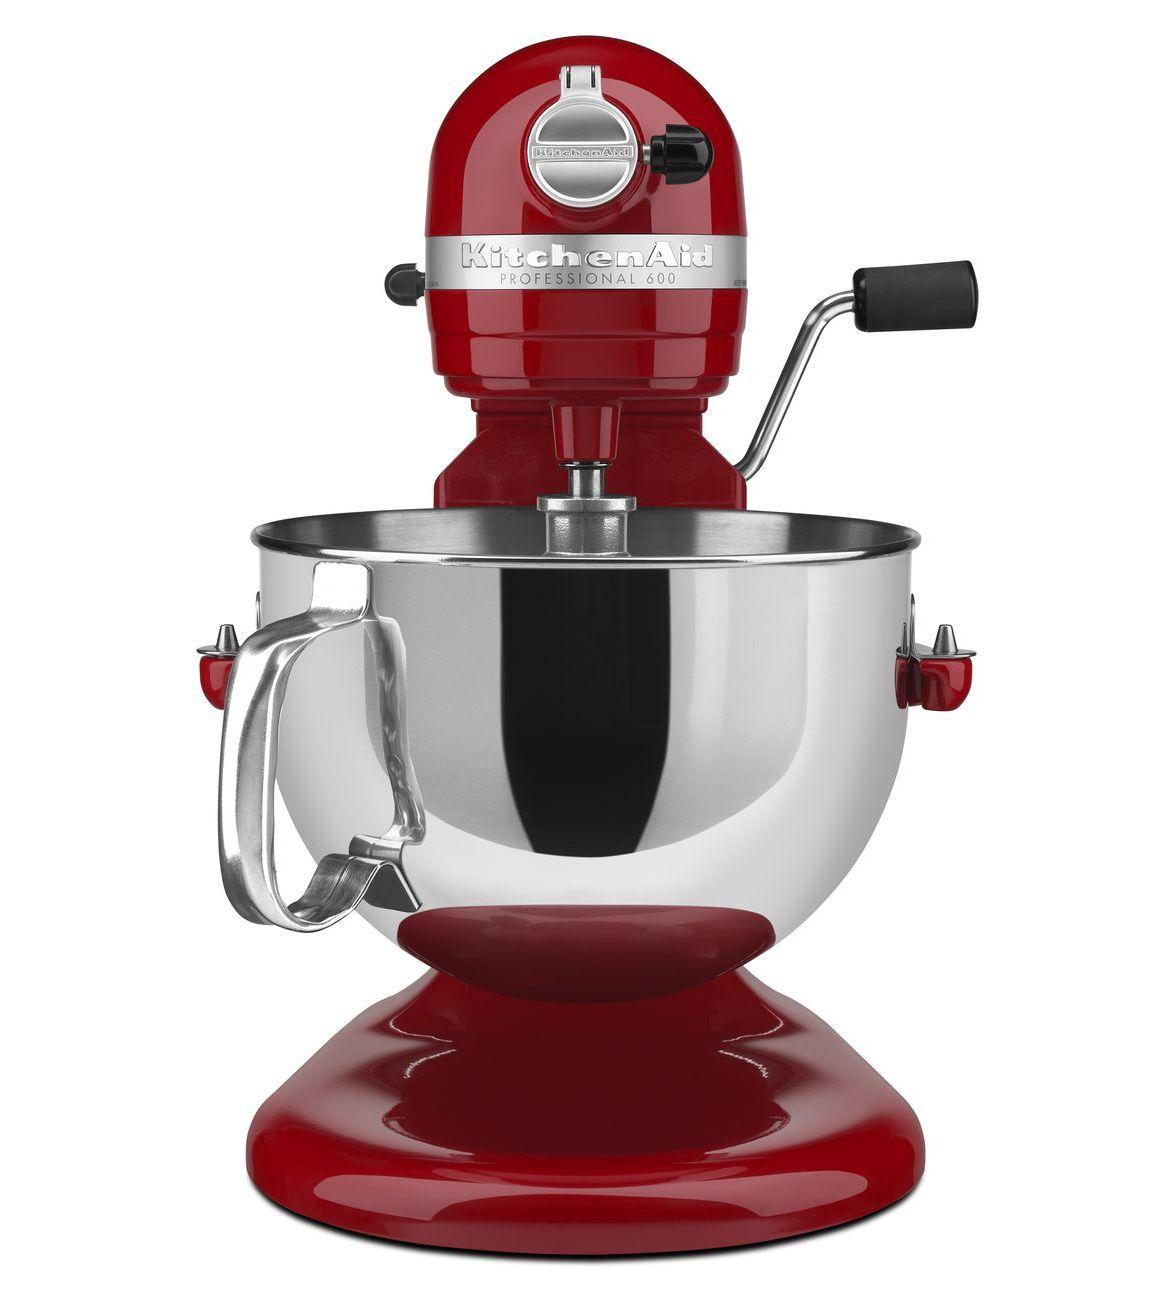 KitchenAid Empire Red 6 Qt. Bowl Lift Professional 600 Series ... on kitchenaid mixers on sale, kitchenaid mixer 500 series, kitchenaid mixer 600 white, kitchenaid professional series, kitchenaid mixer 6500 series, kitchenaid stand mixer pro series,